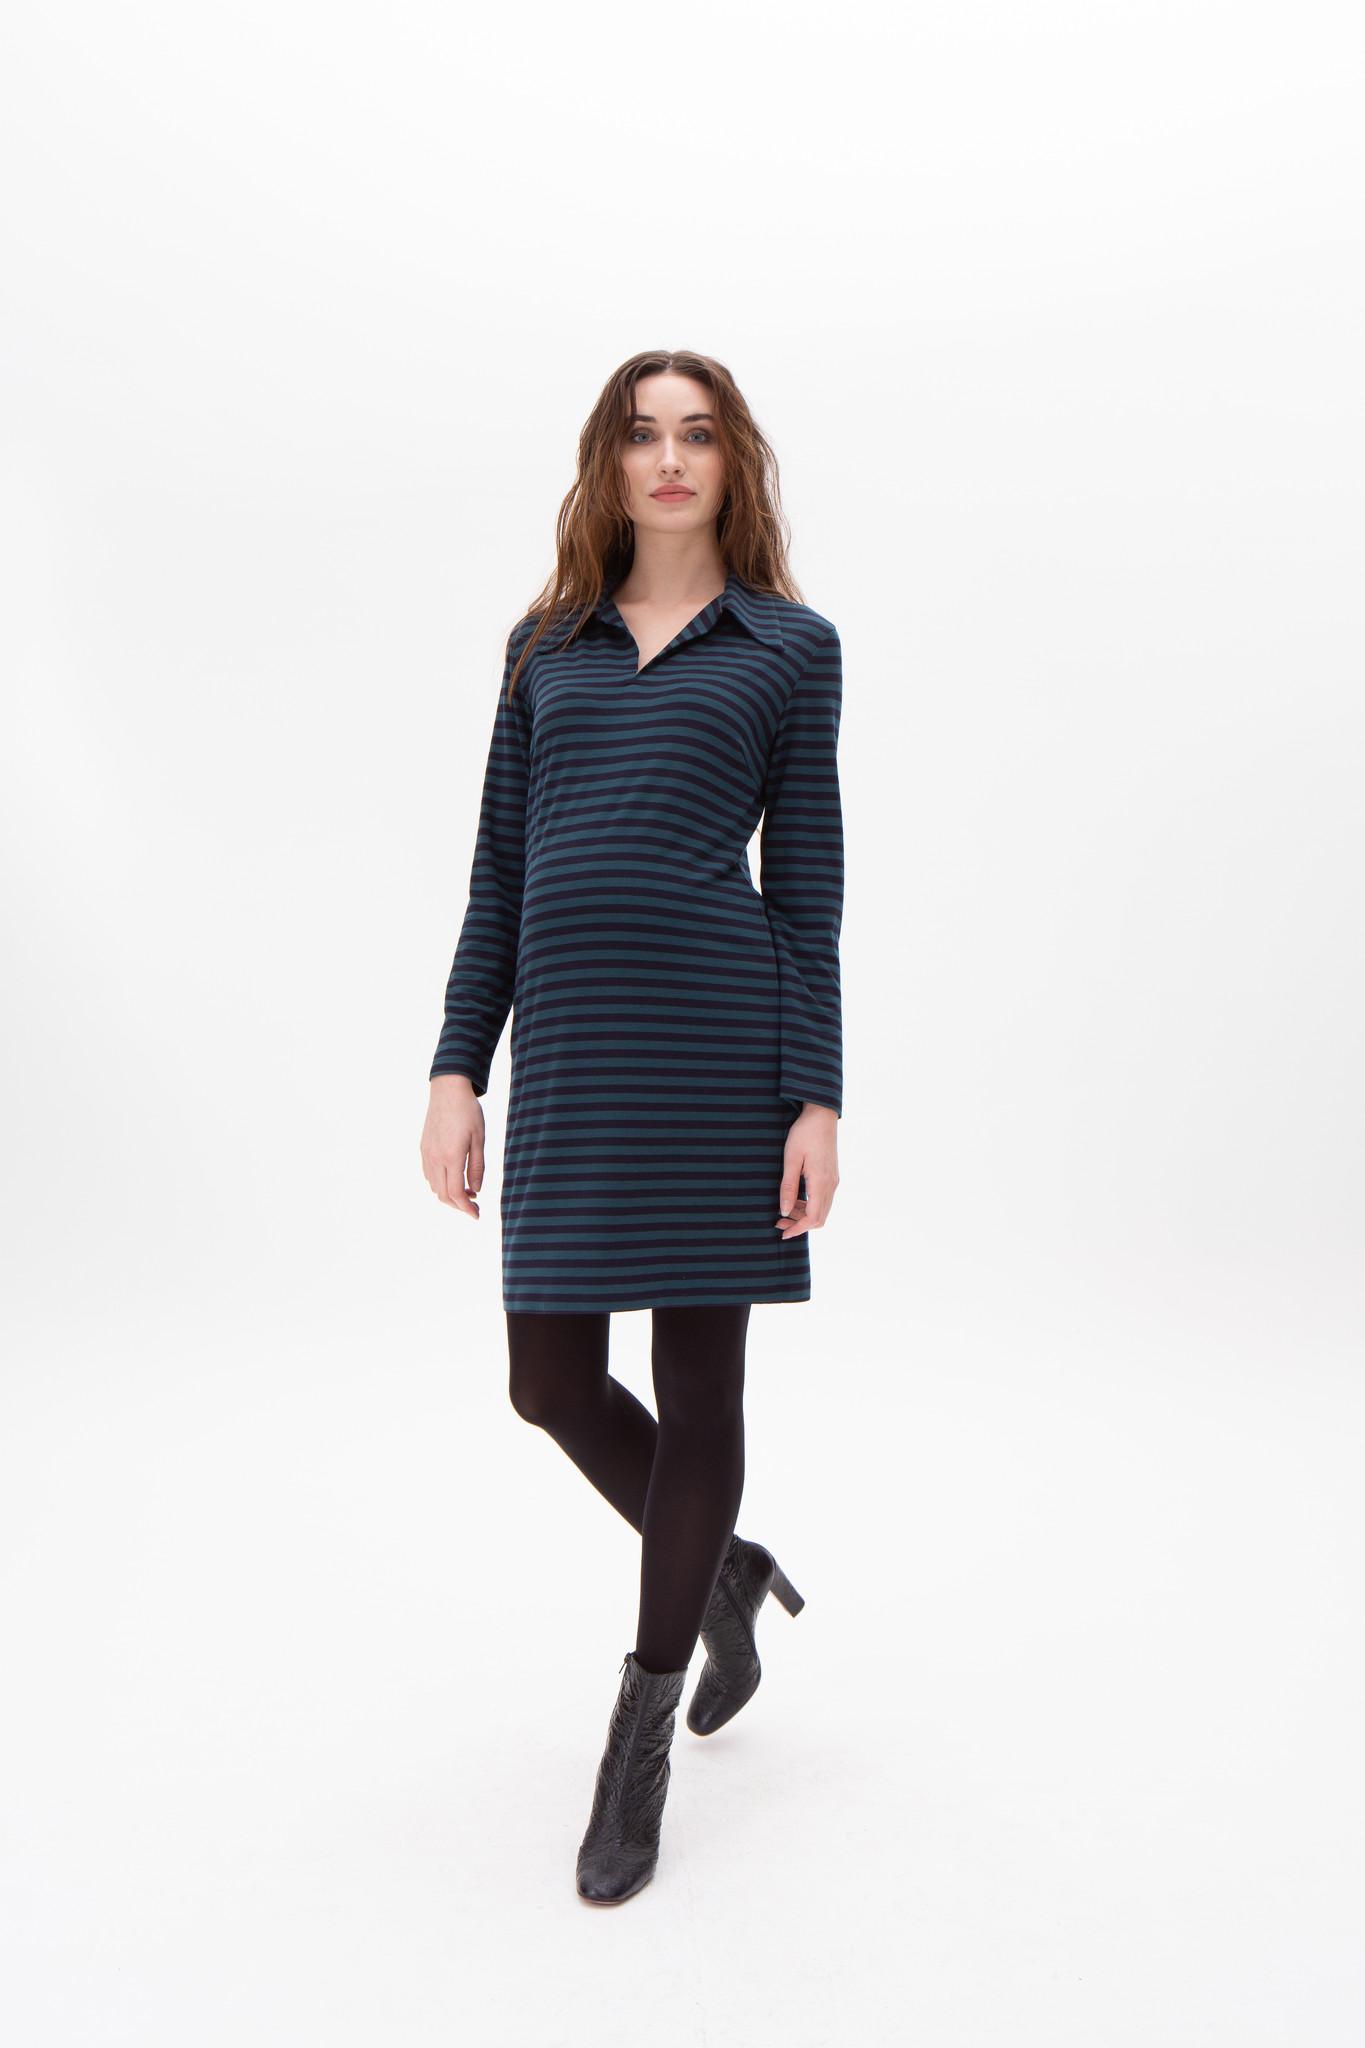 Polo dress - petrol/navy-1